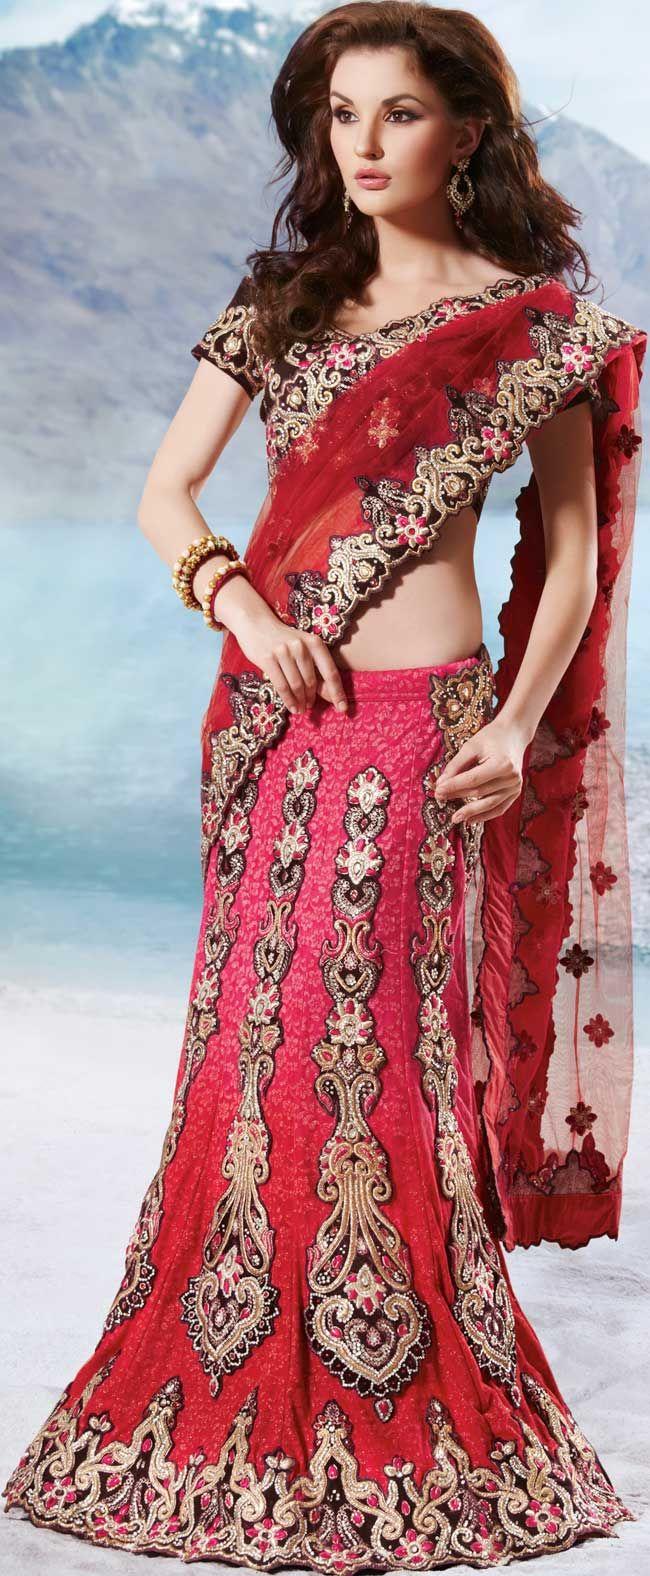 Red Net Stone And Cut Work A Line Wedding Lehenga Style Saree 26155